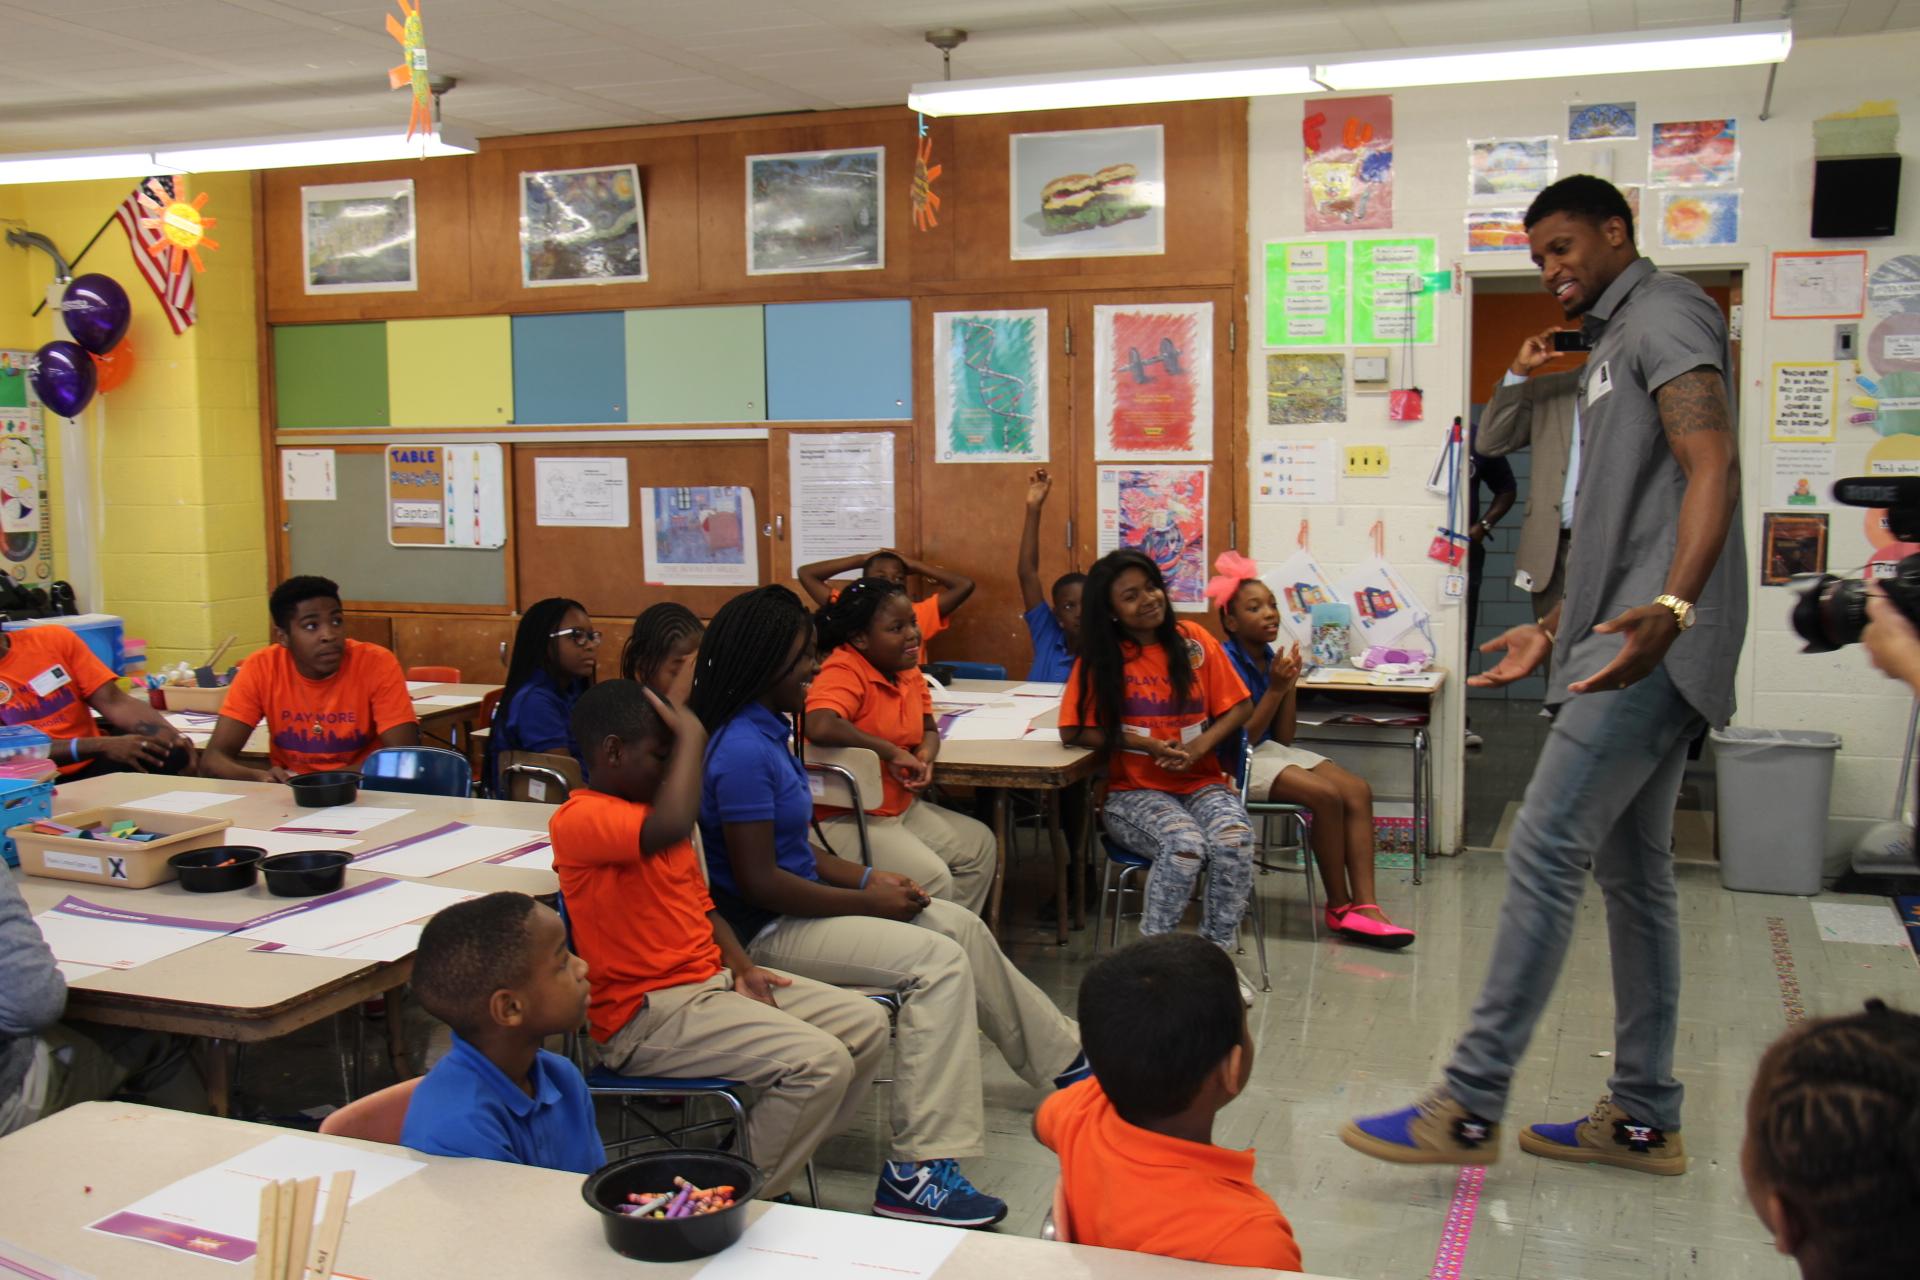 Baltimore native and NBA star Rudy Gay meets the Play More B'More interns